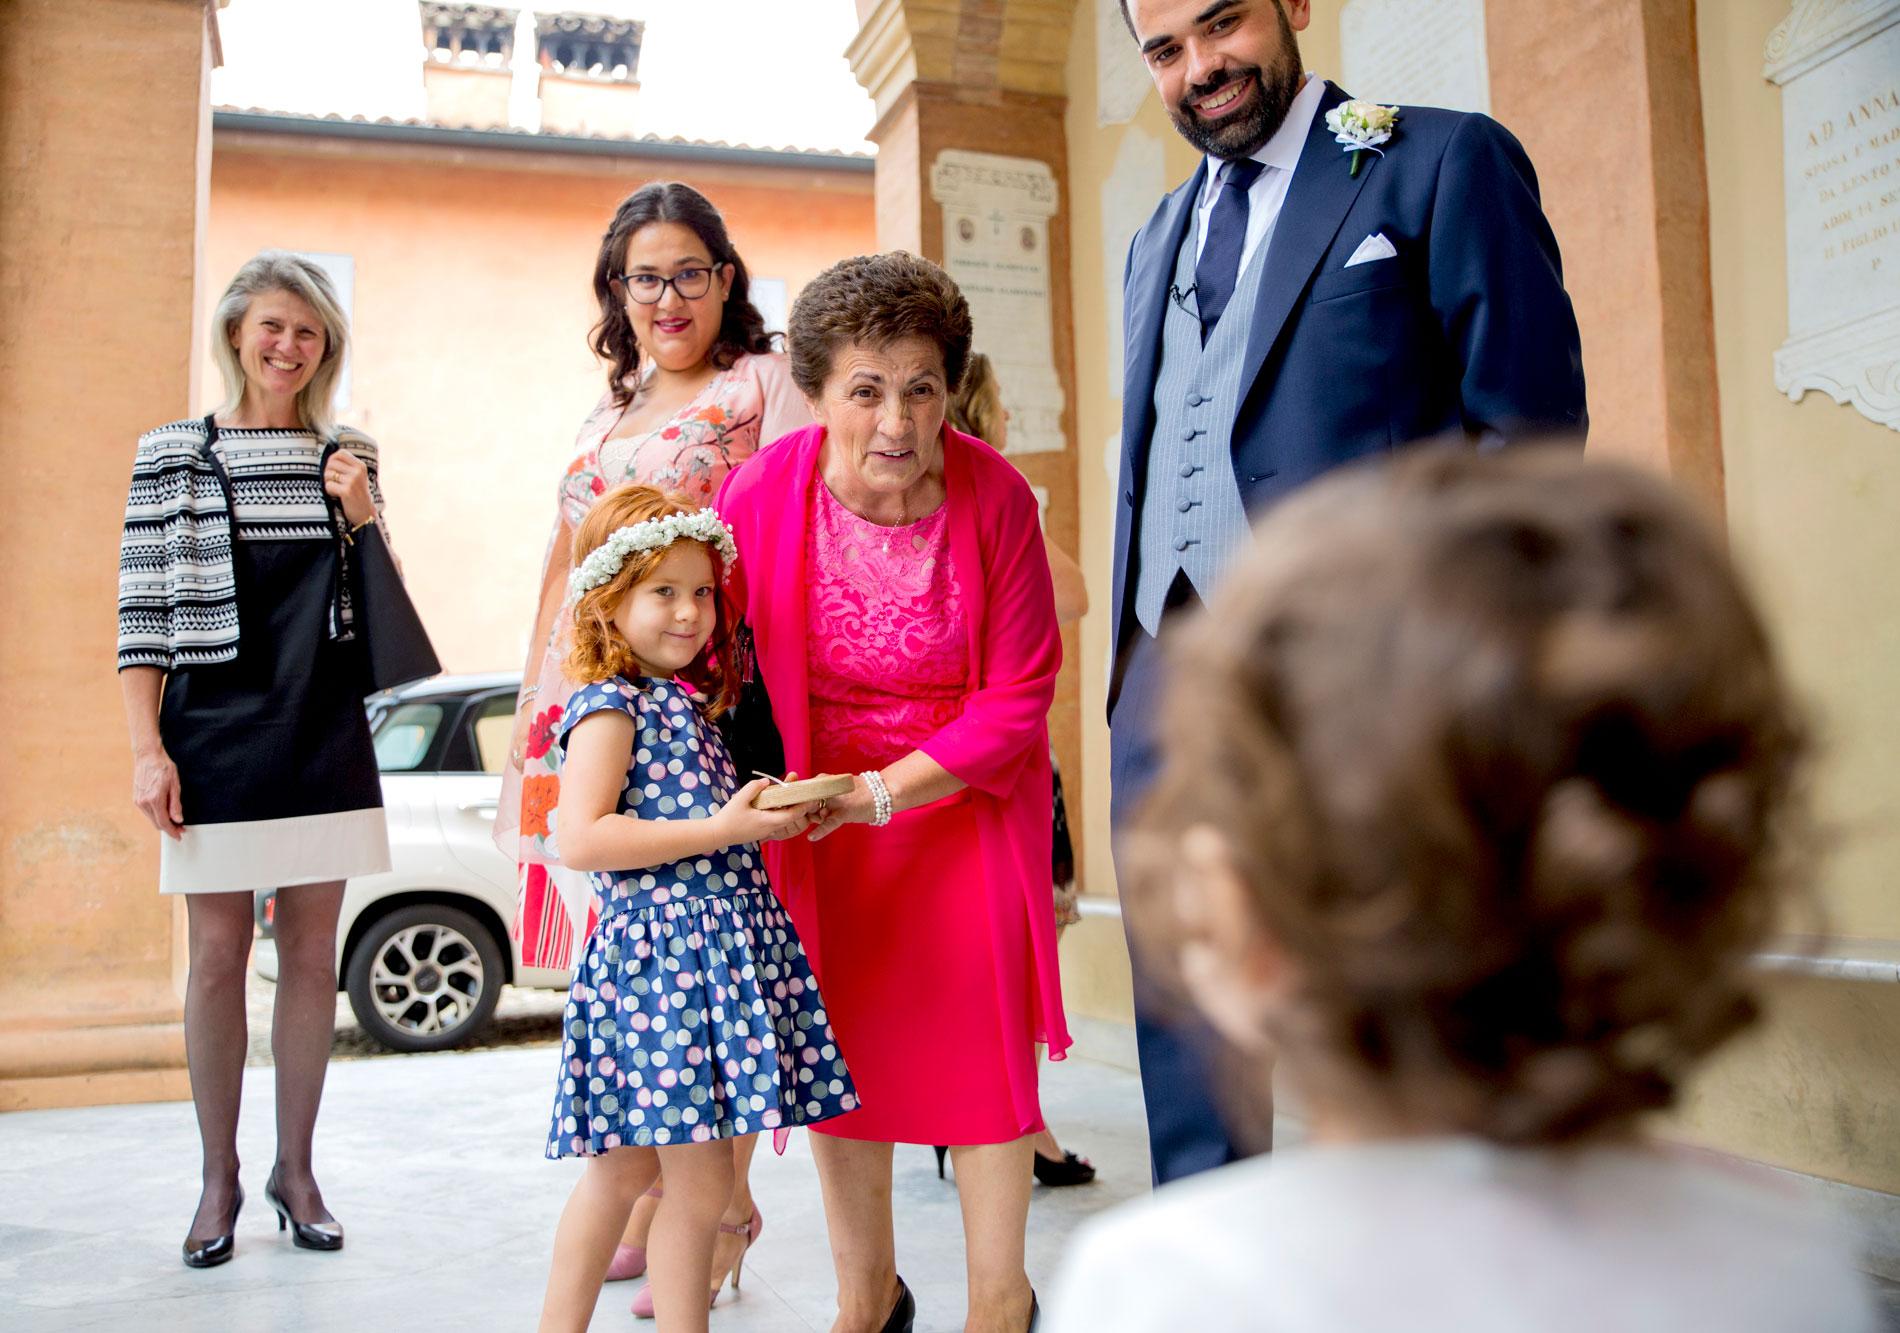 ivano-di-maria-wedding-photographer-giu-eman-5